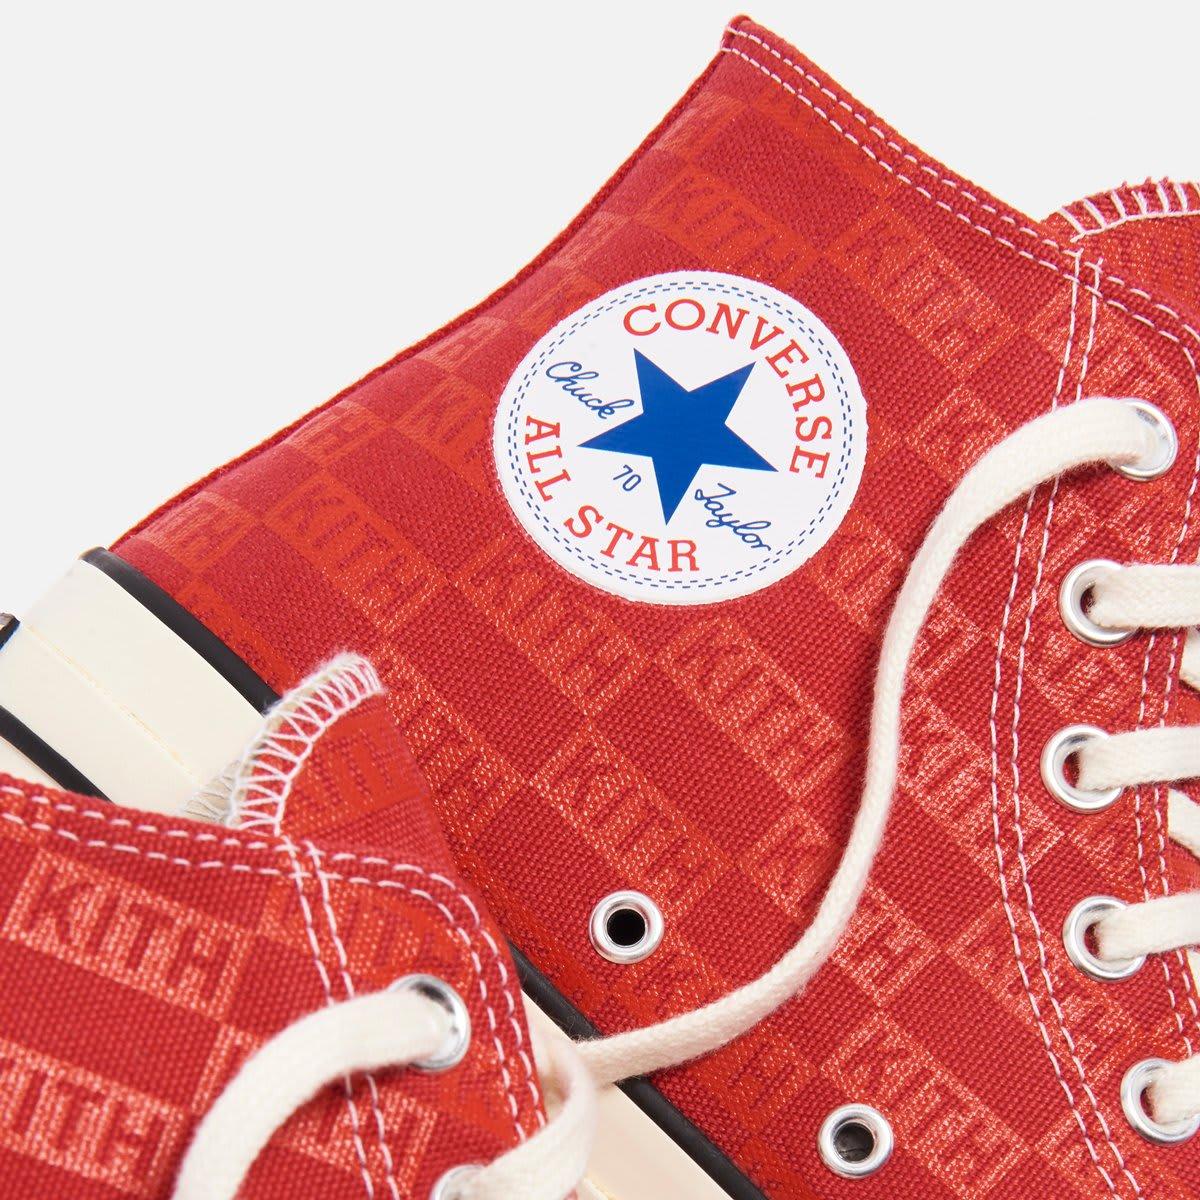 Kith x Converse Chuck 70 'Red' (Detail)